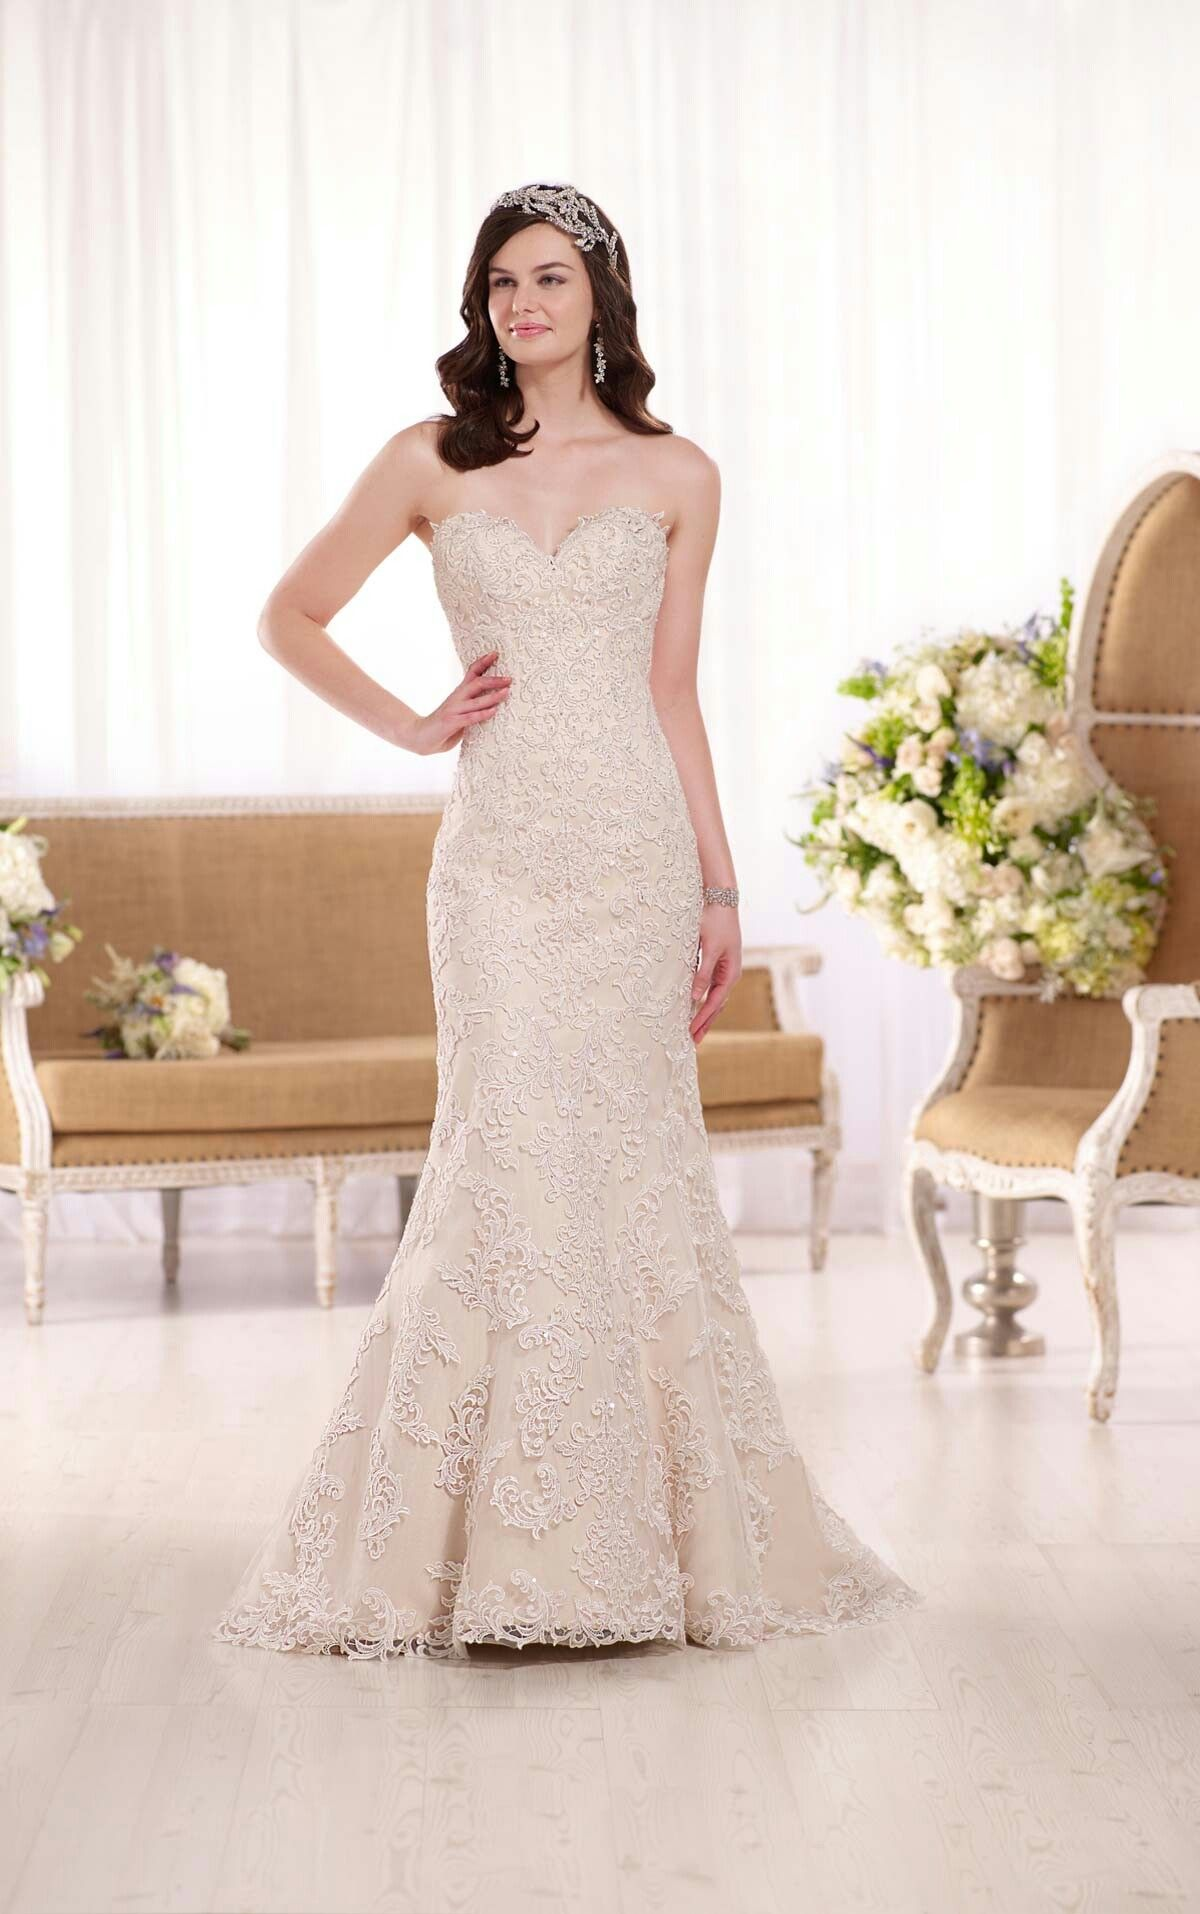 Pin by Amanda Serrato on Future wedding Bridal dresses